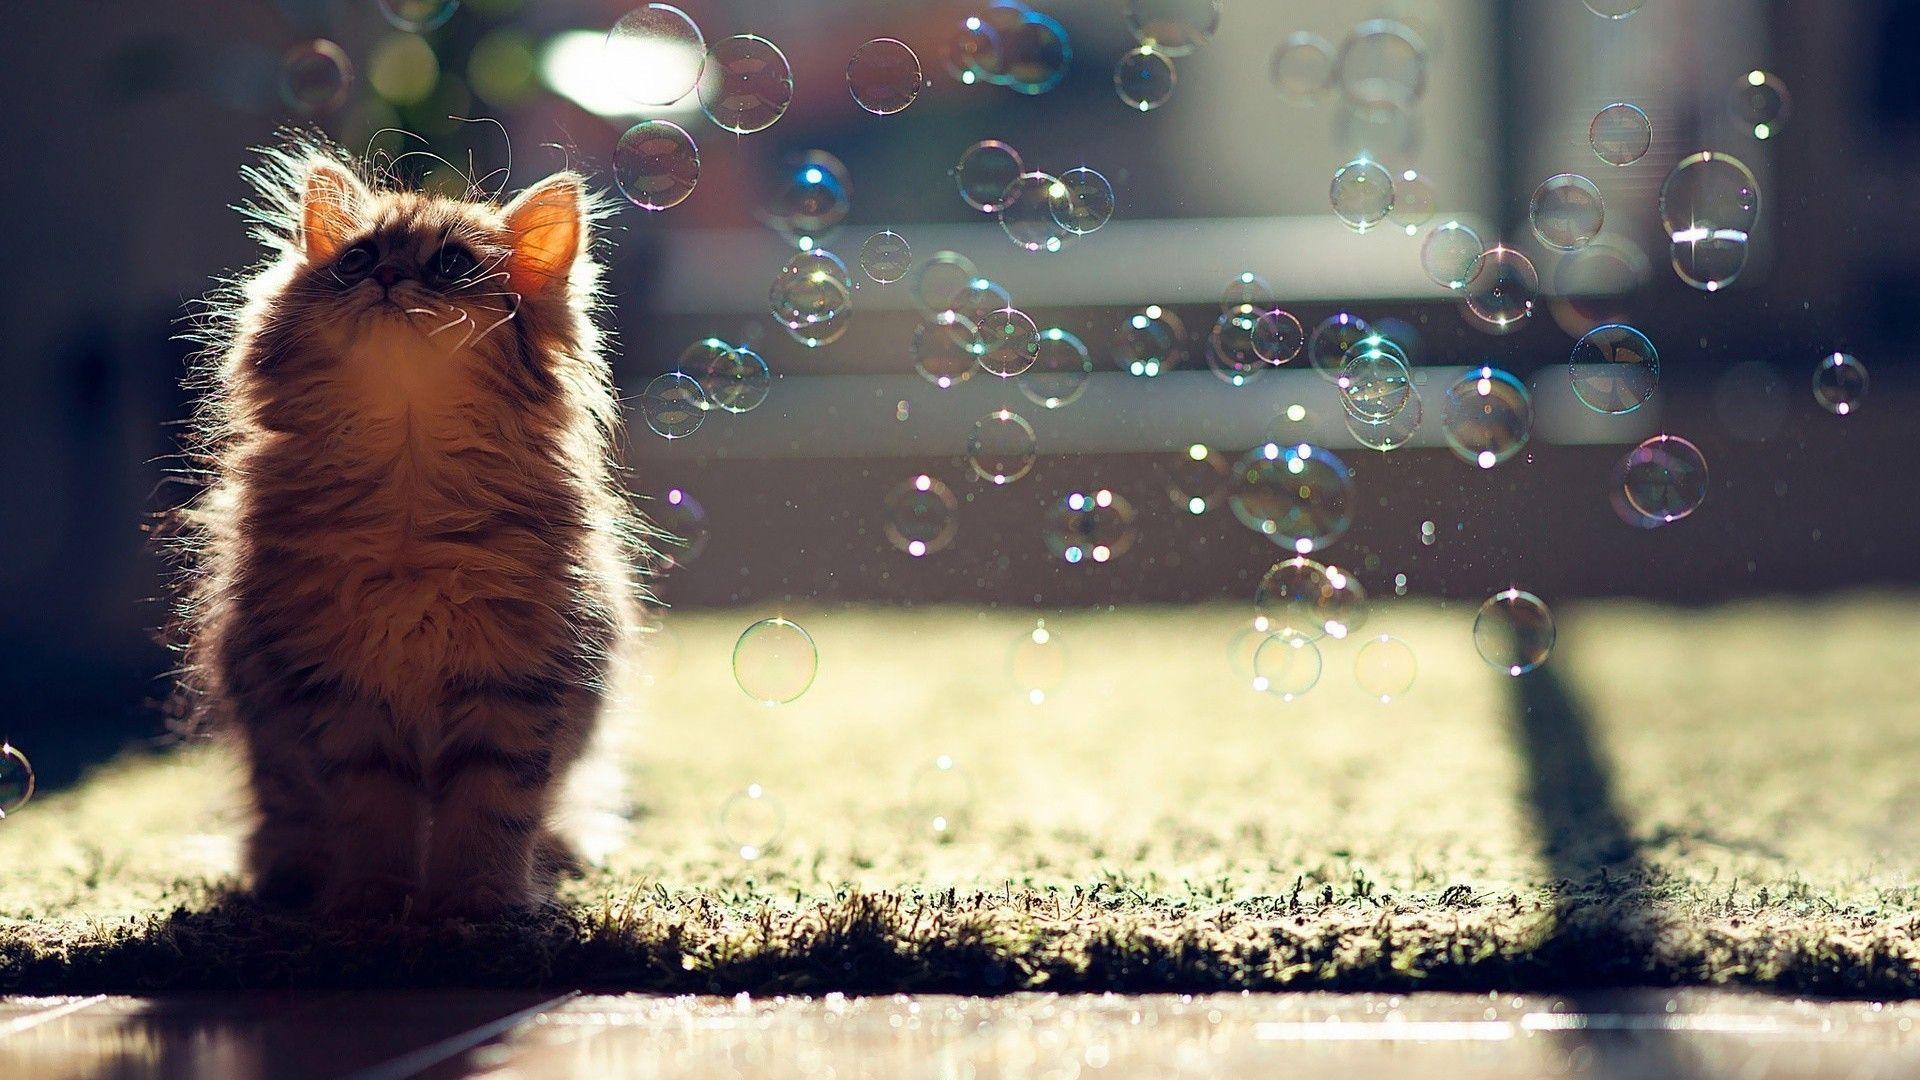 Cute Fluffy Kitten Hd Wallpaper 1920x1080 Id 45396